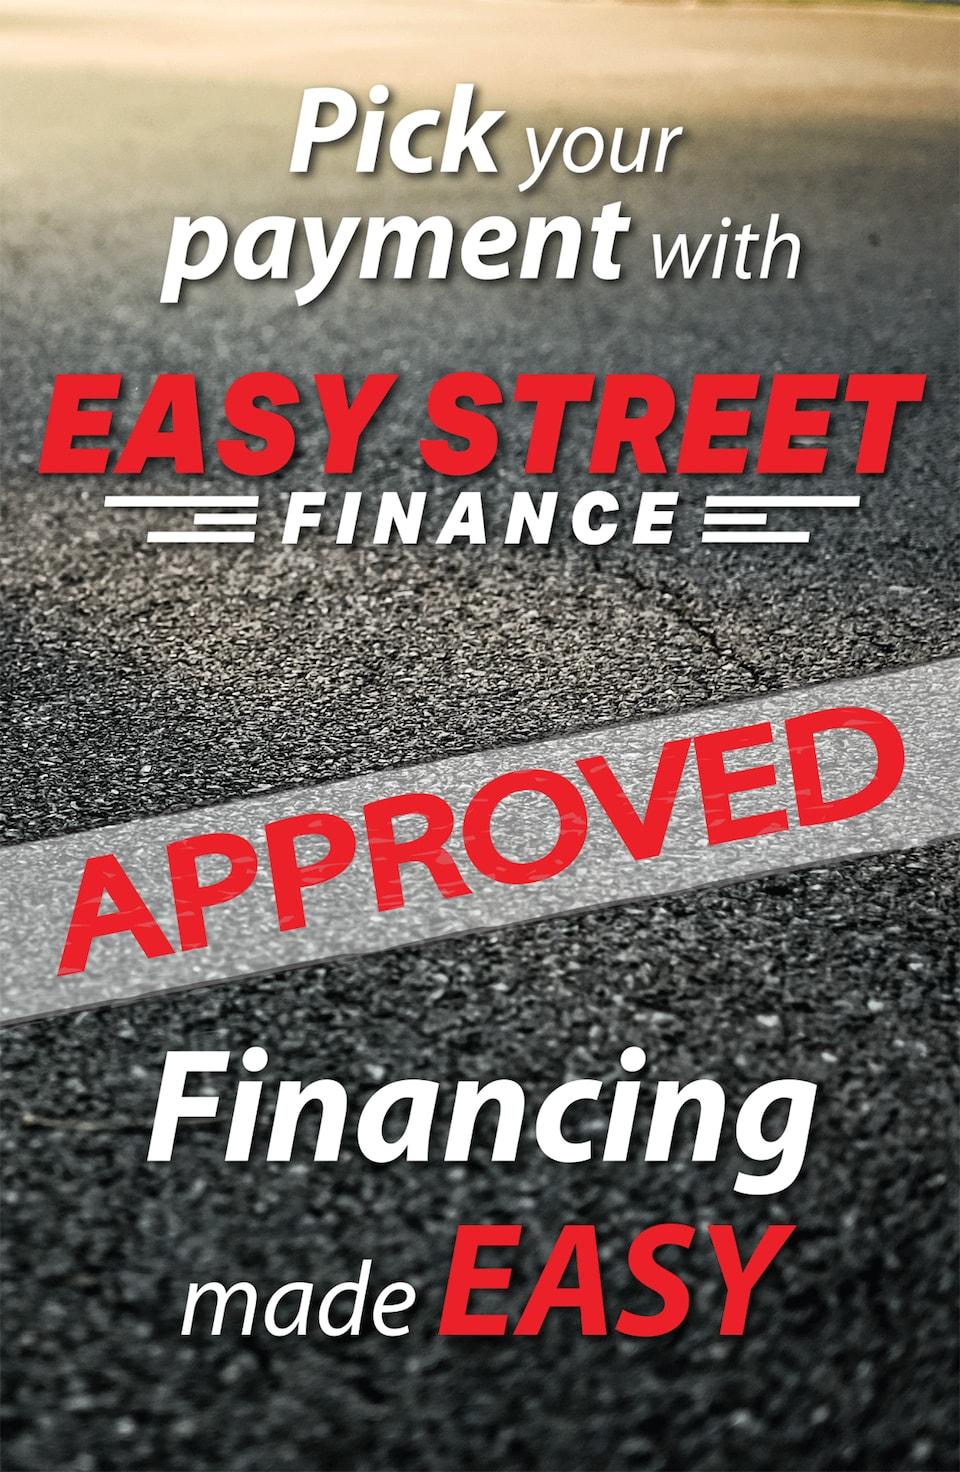 Easy Street Financing